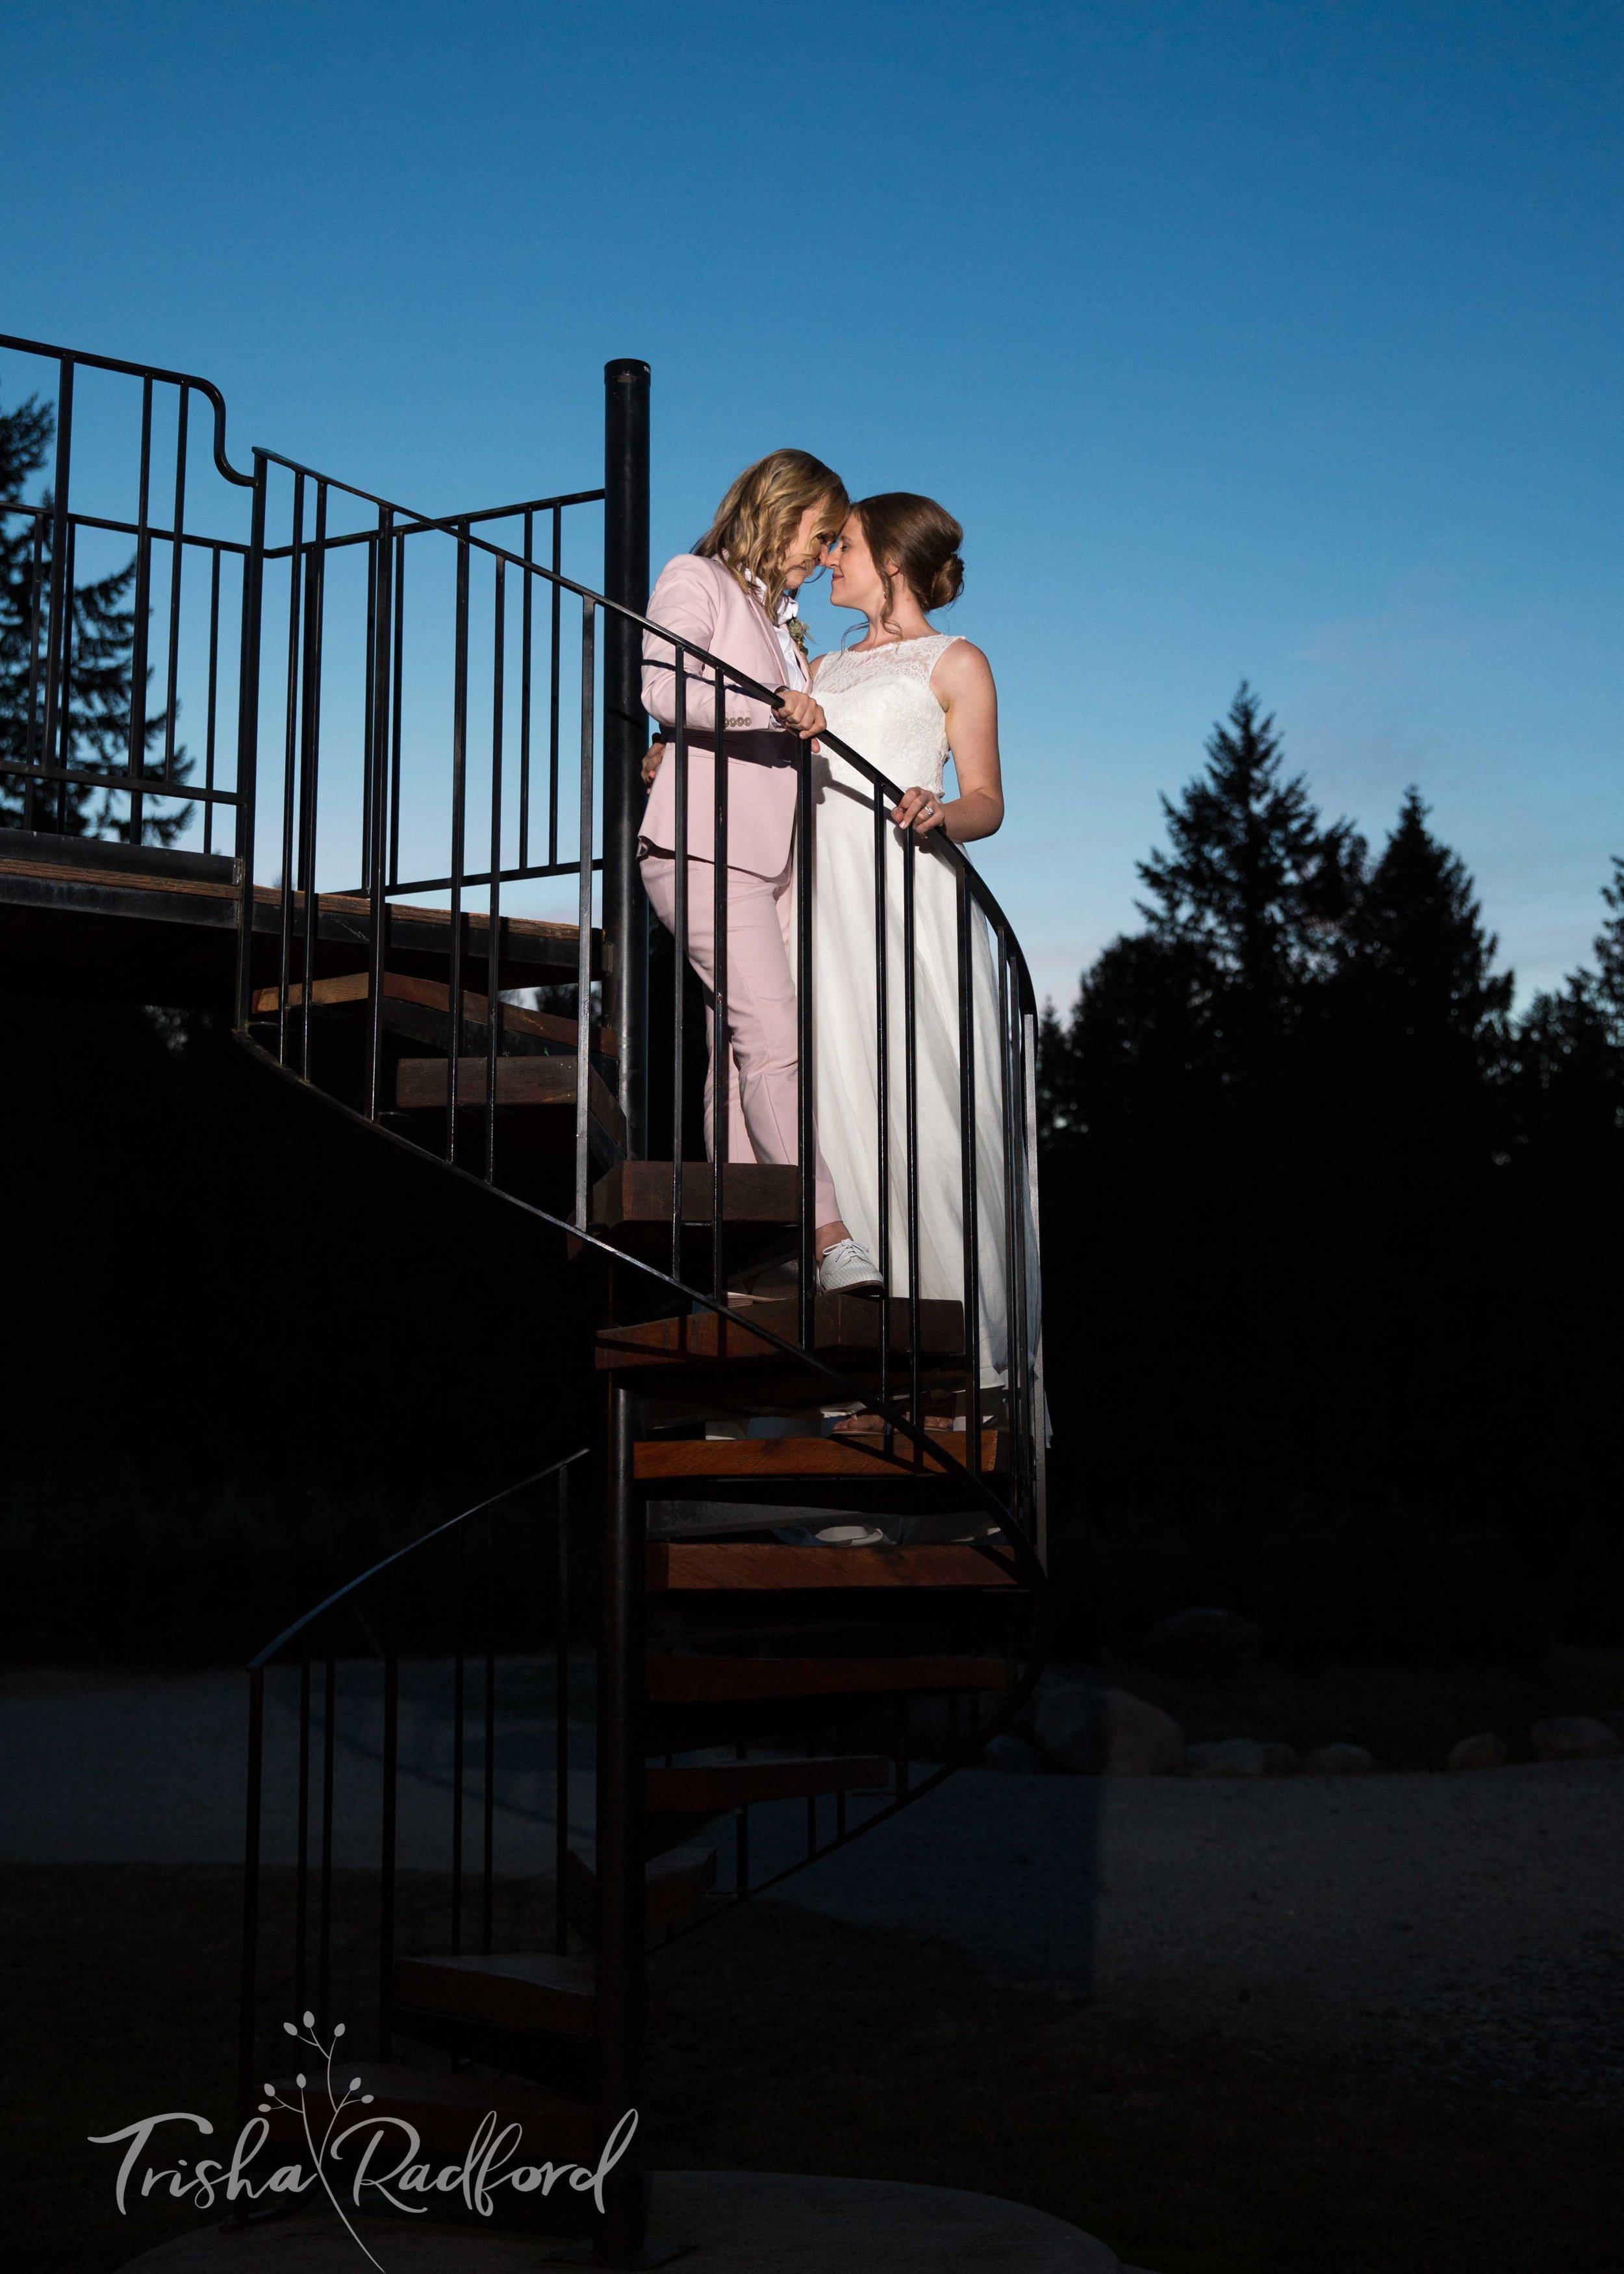 Wedding Photography at Trinity Tree Farm, Issaquah WA